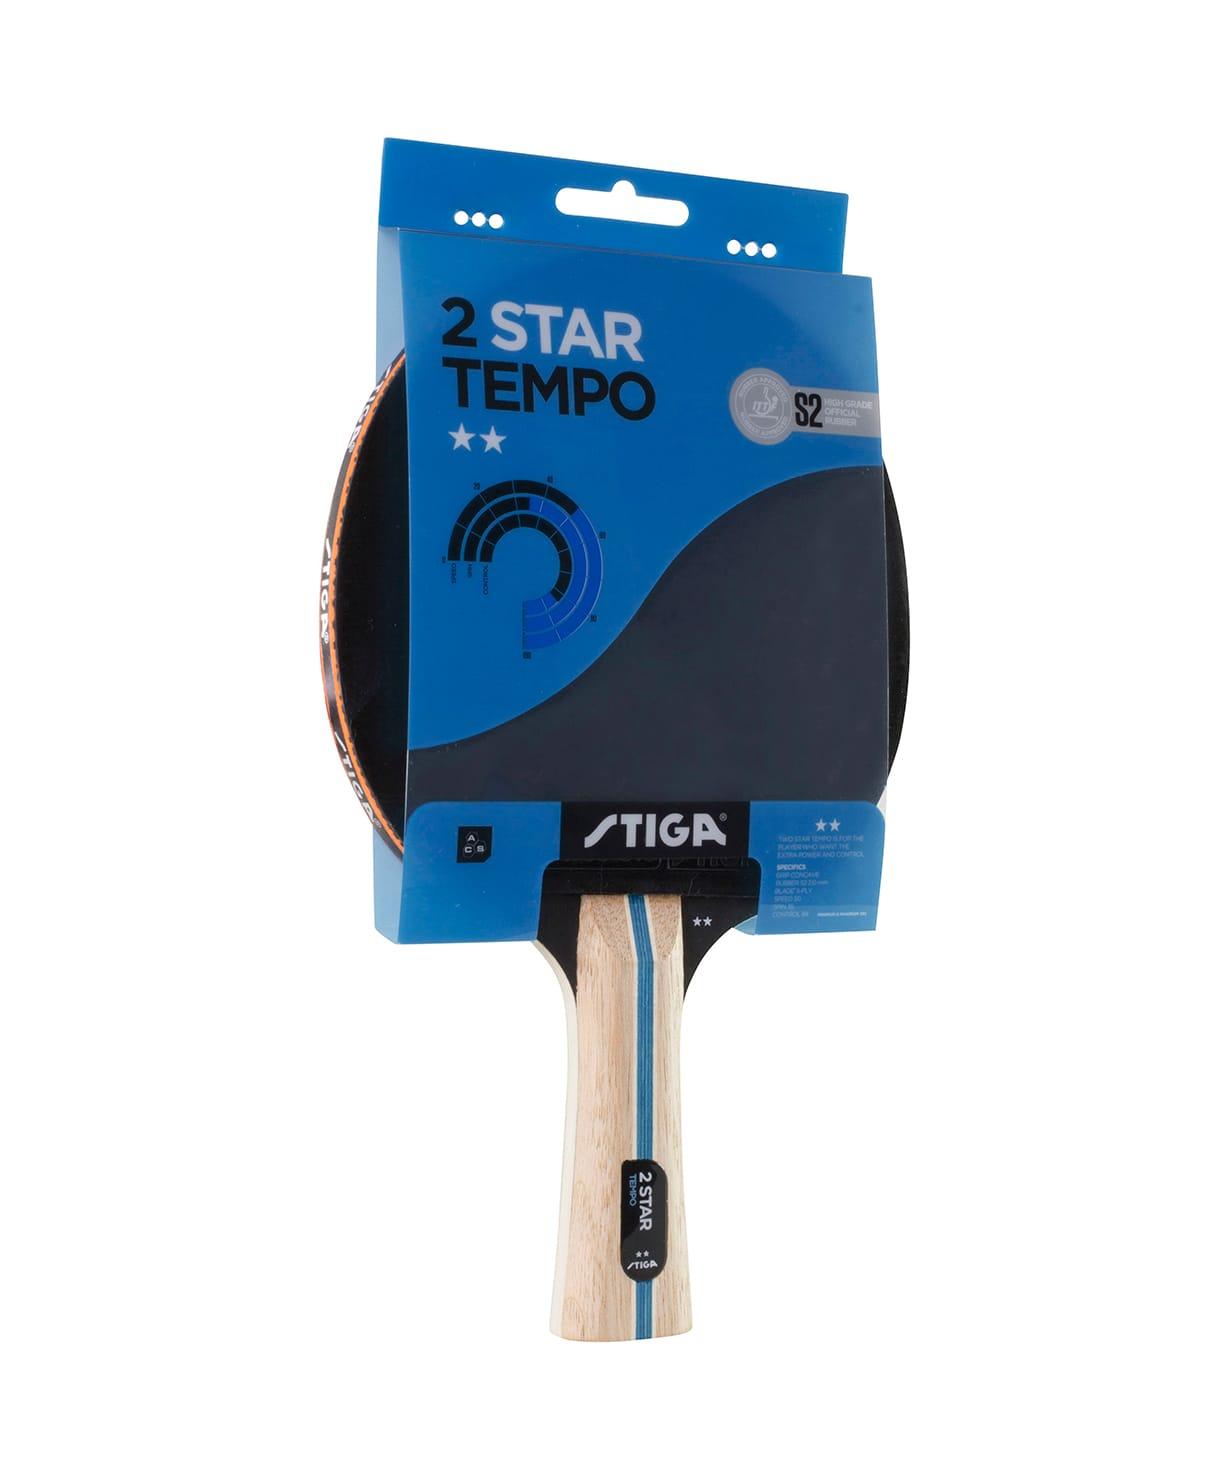 Ракетка для настольного тенниса Stiga 2 Stars Tempo ракетка для настольного тенниса stiga technic 2 звезды 1212 3516 01